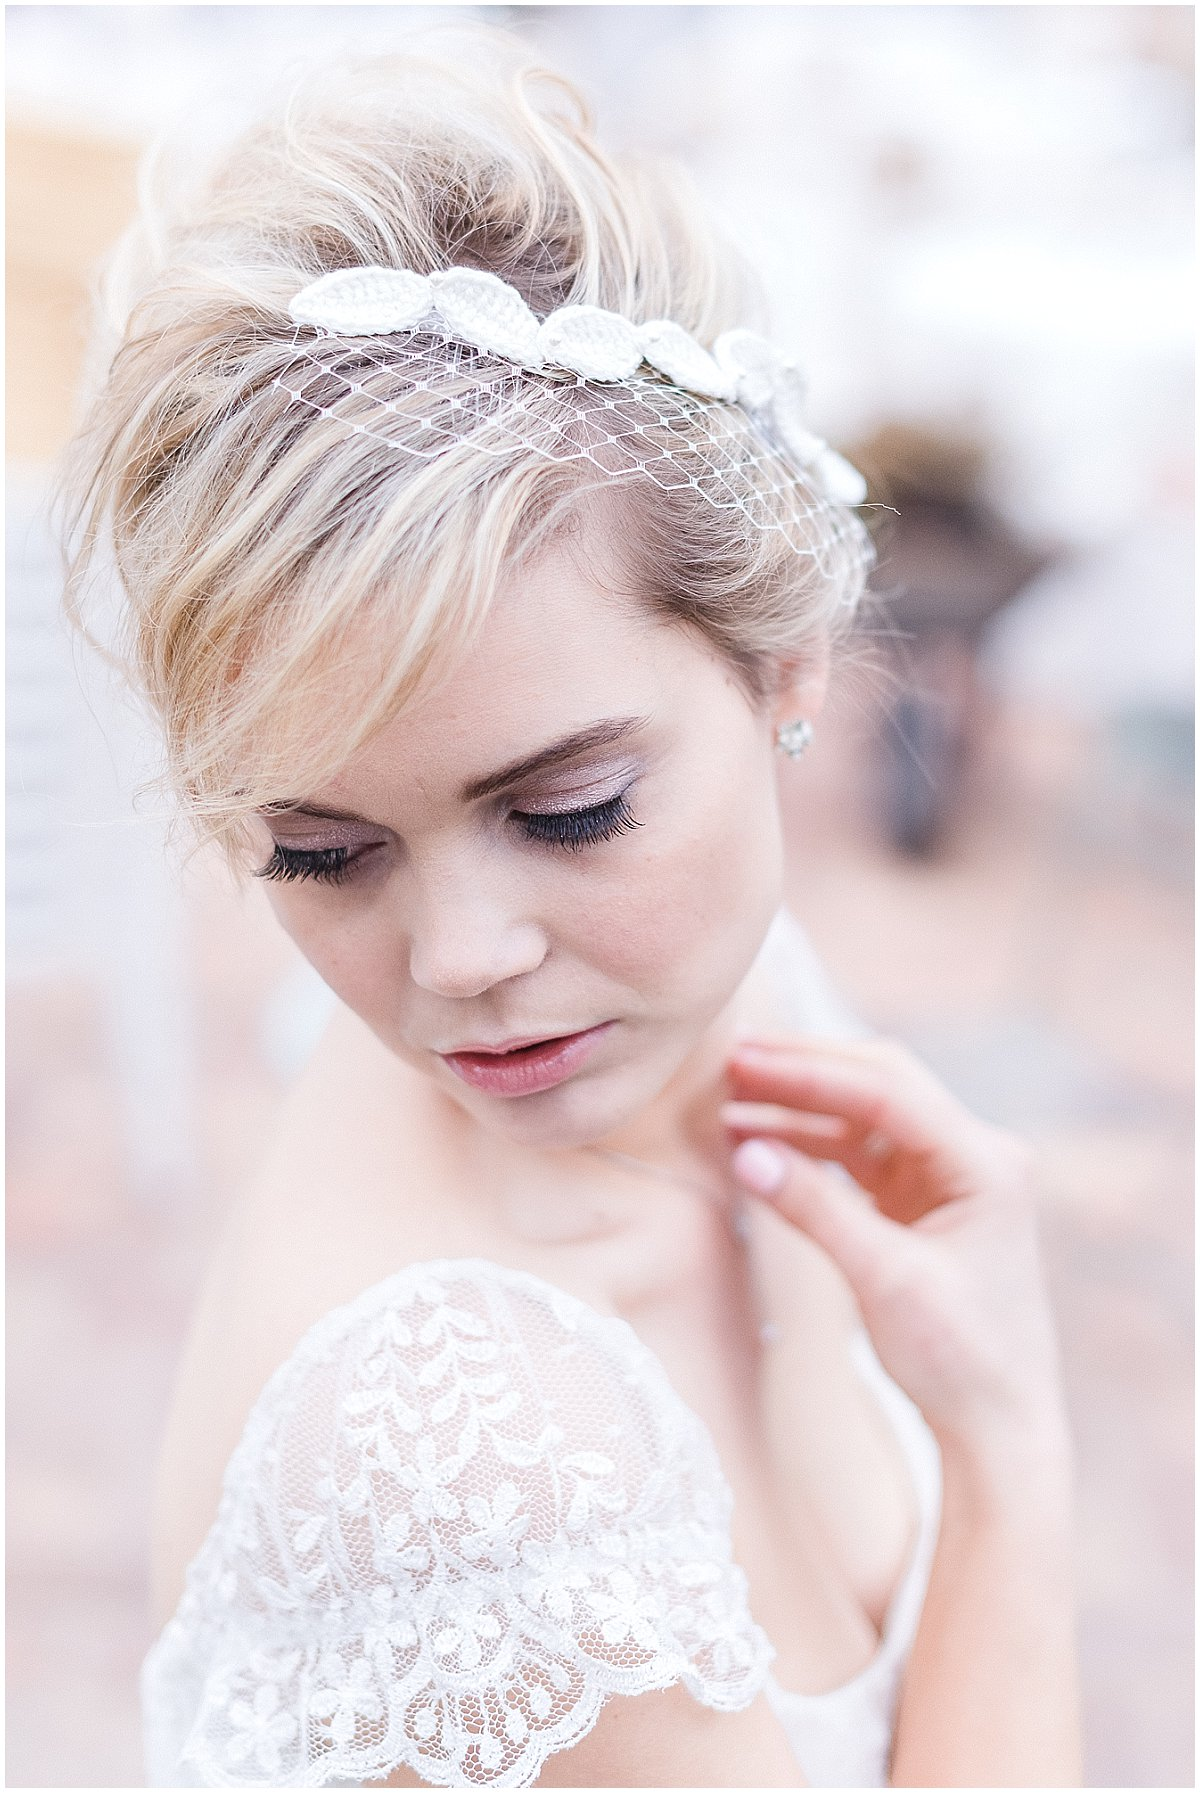 27 Wedding Hairstyles That Work Well With Veils  Brides